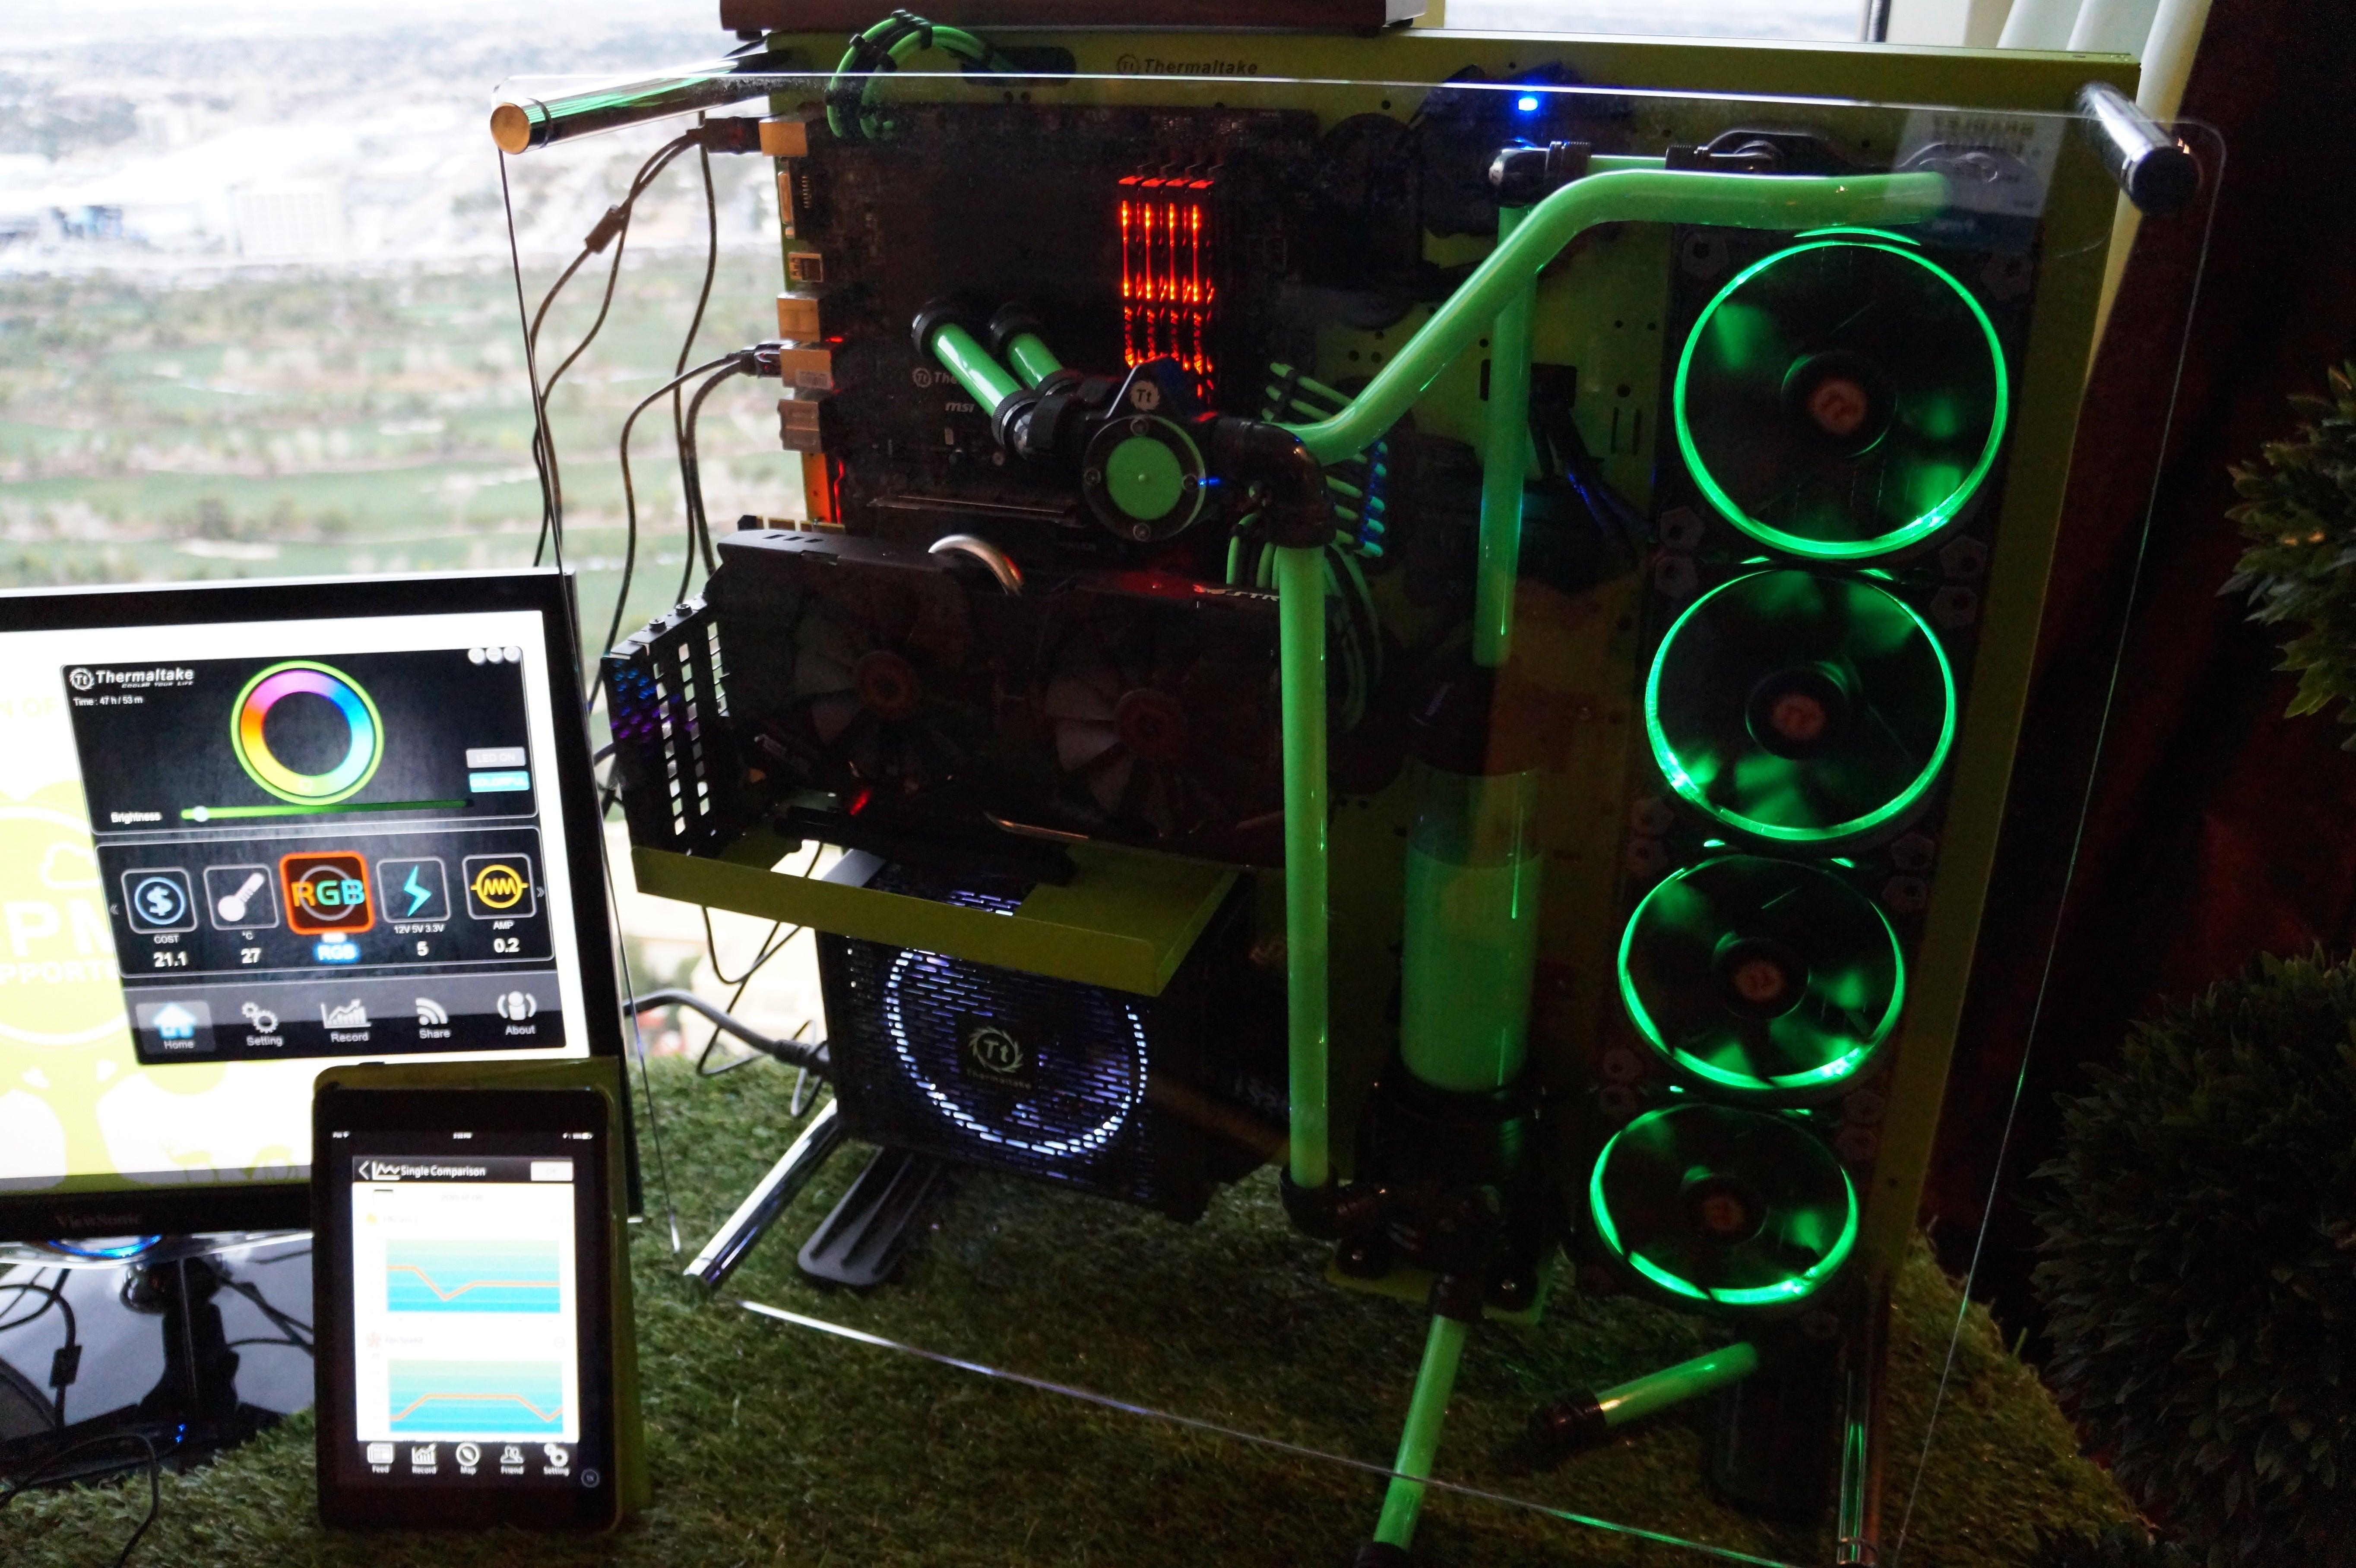 Smart Liquid Cooled Rgb Lit Pc Power Supplies Prove Psu